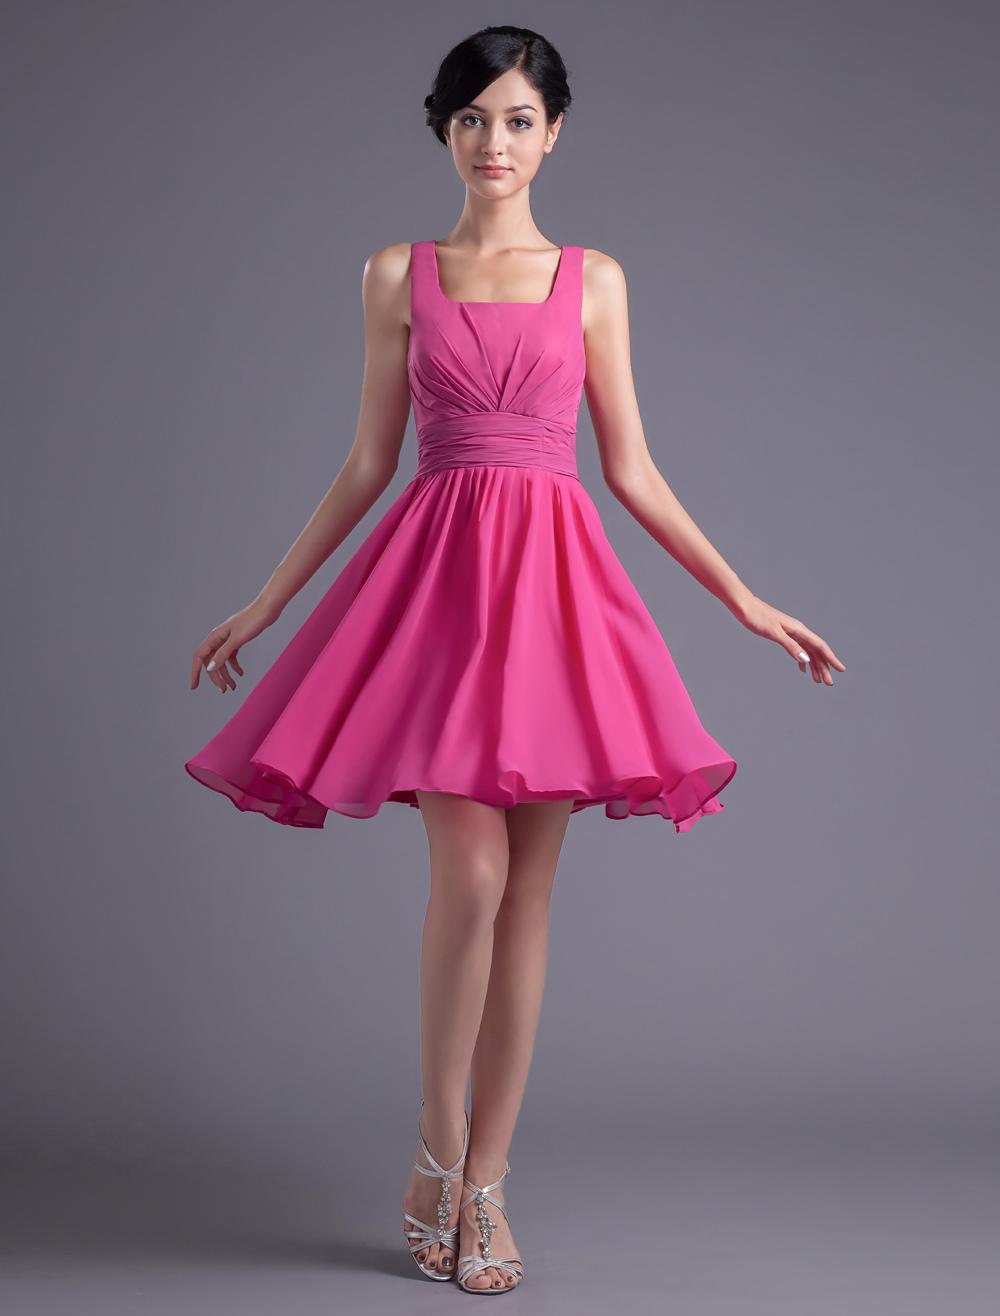 Mini vestido de damas de color fucsia de gasa de línea A - Milanoo.com